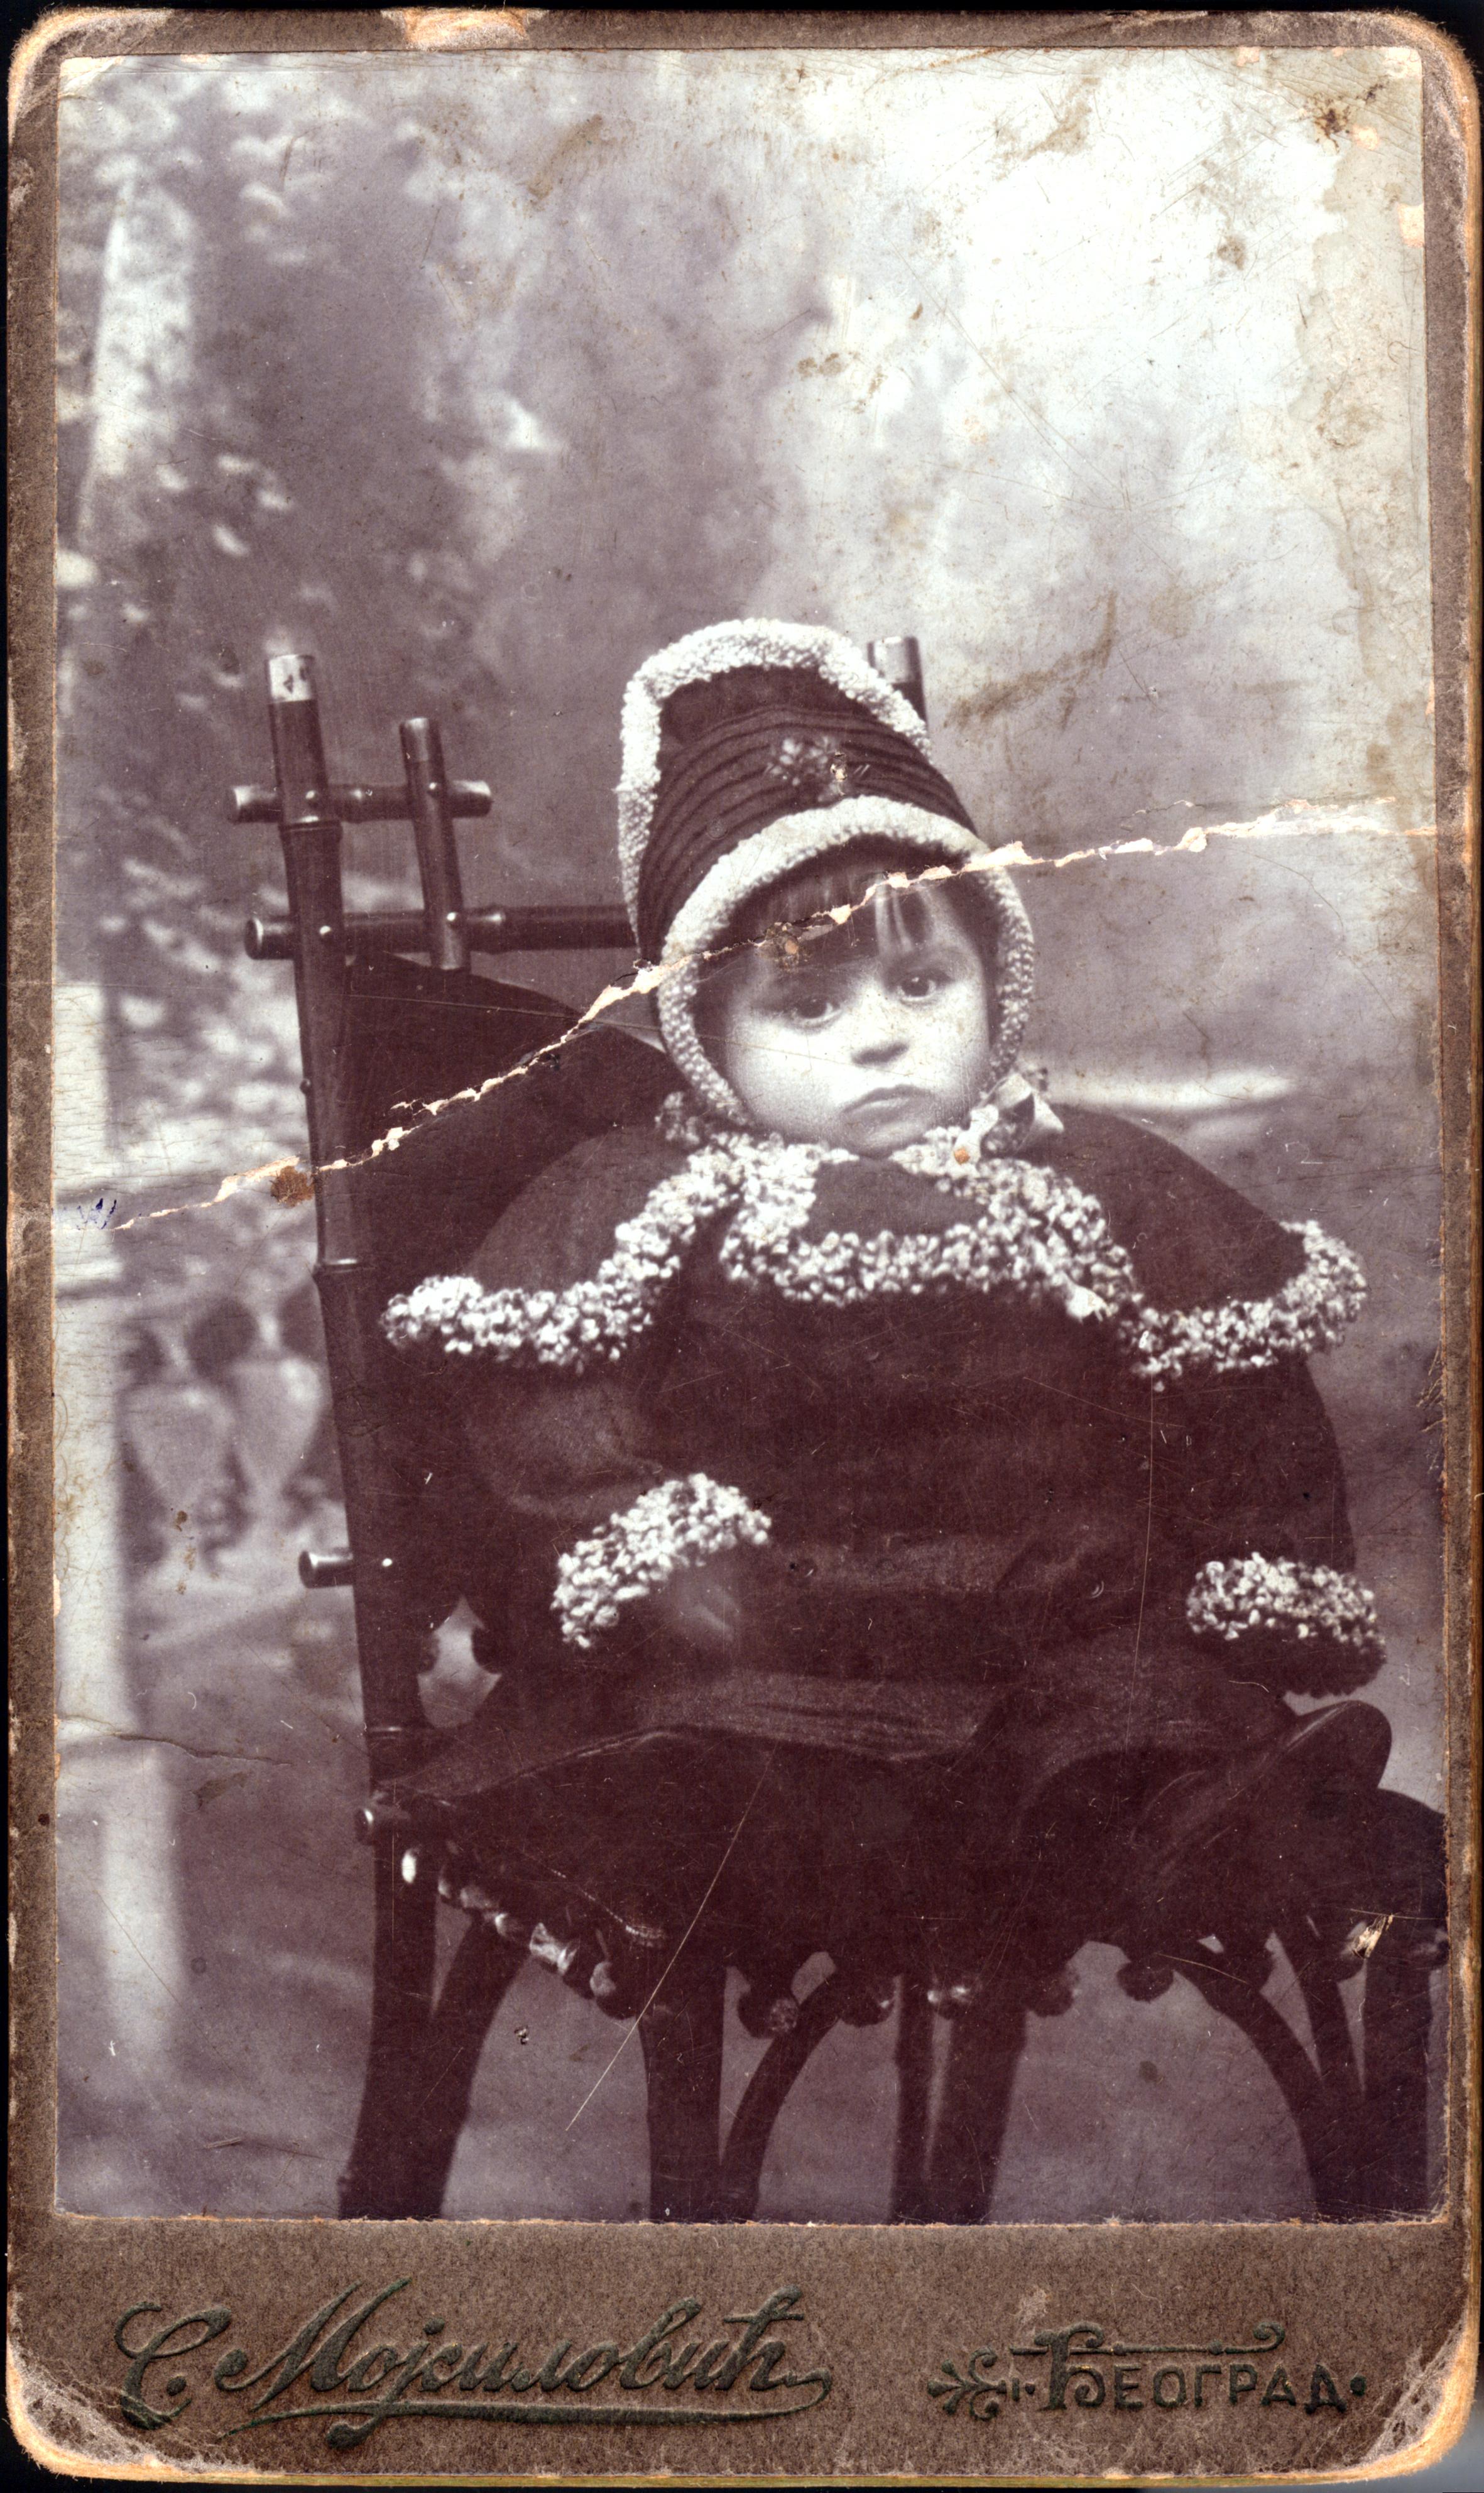 Avram Kalef as a young boy